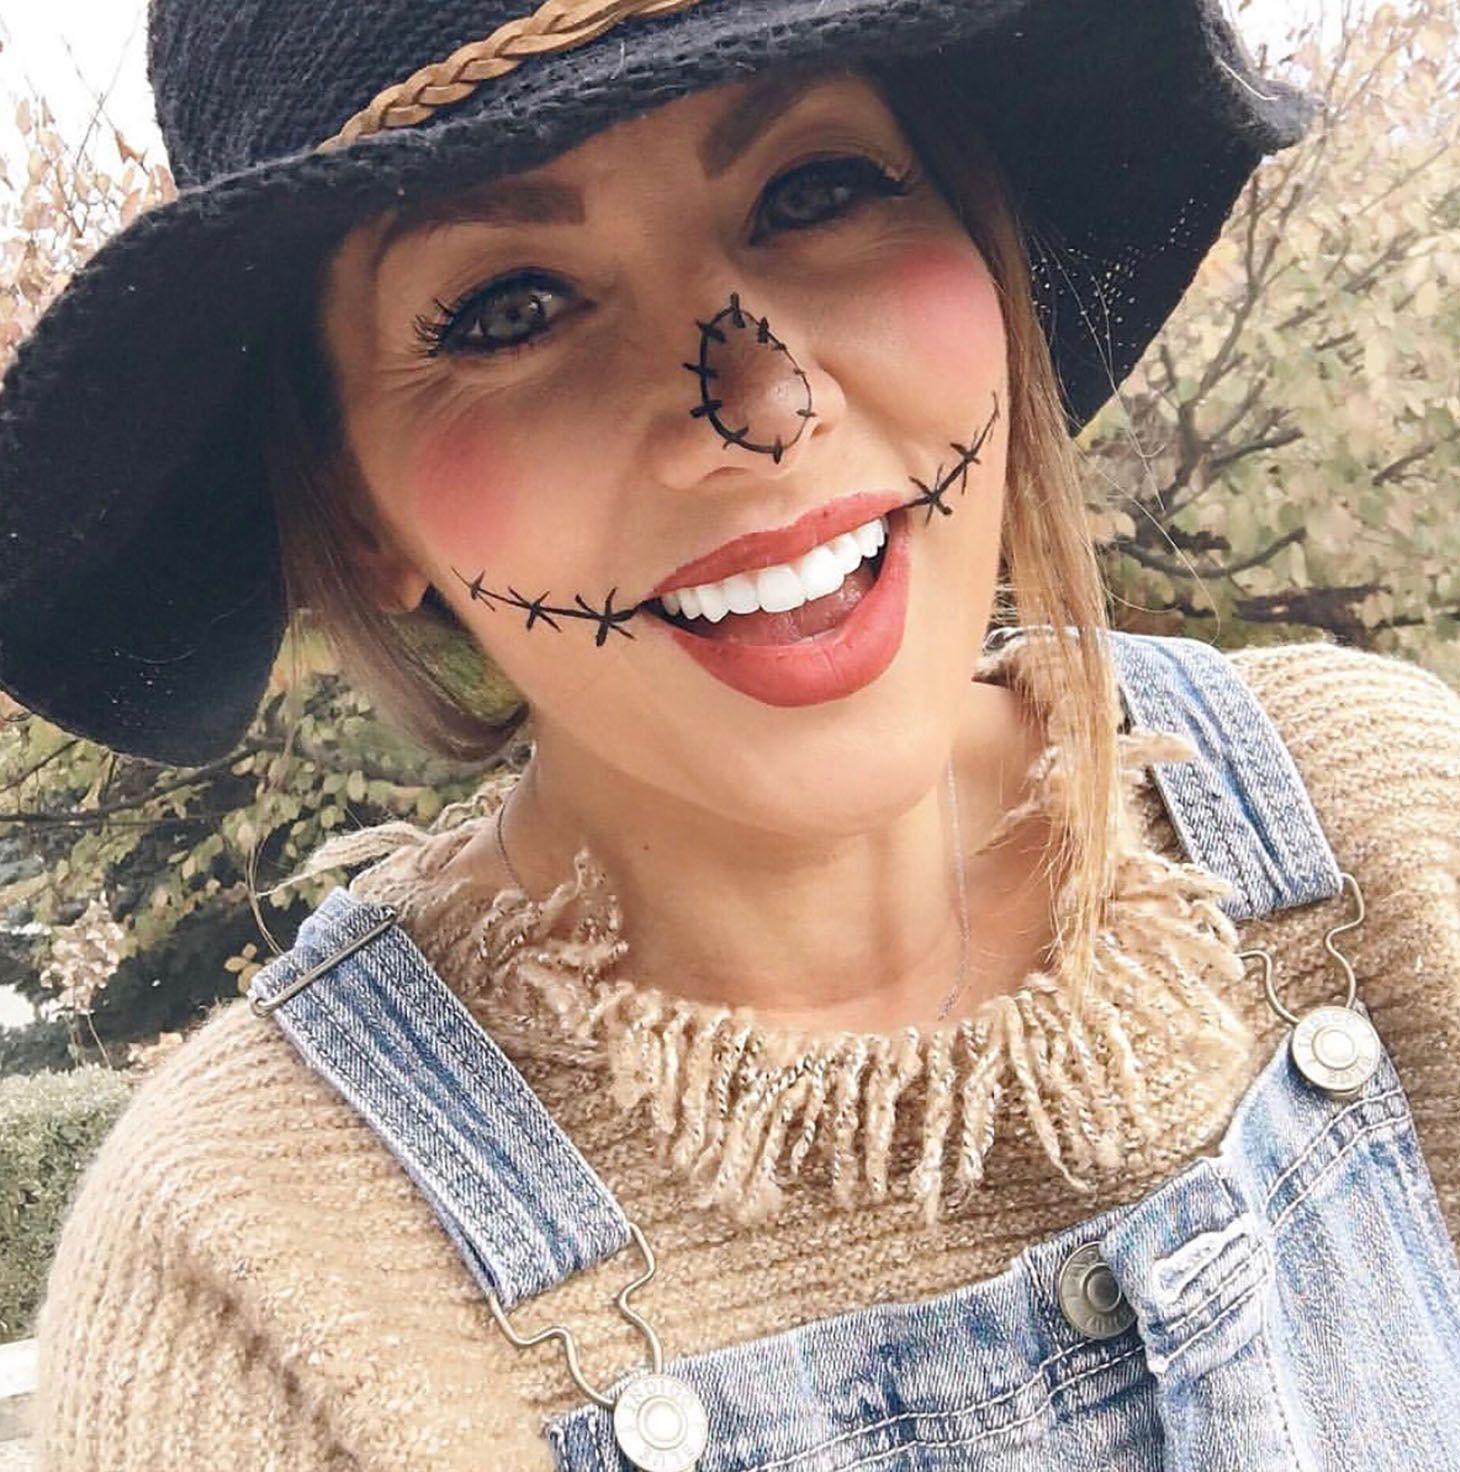 Last Minute Halloween Costumes From Your Closet (Jillian